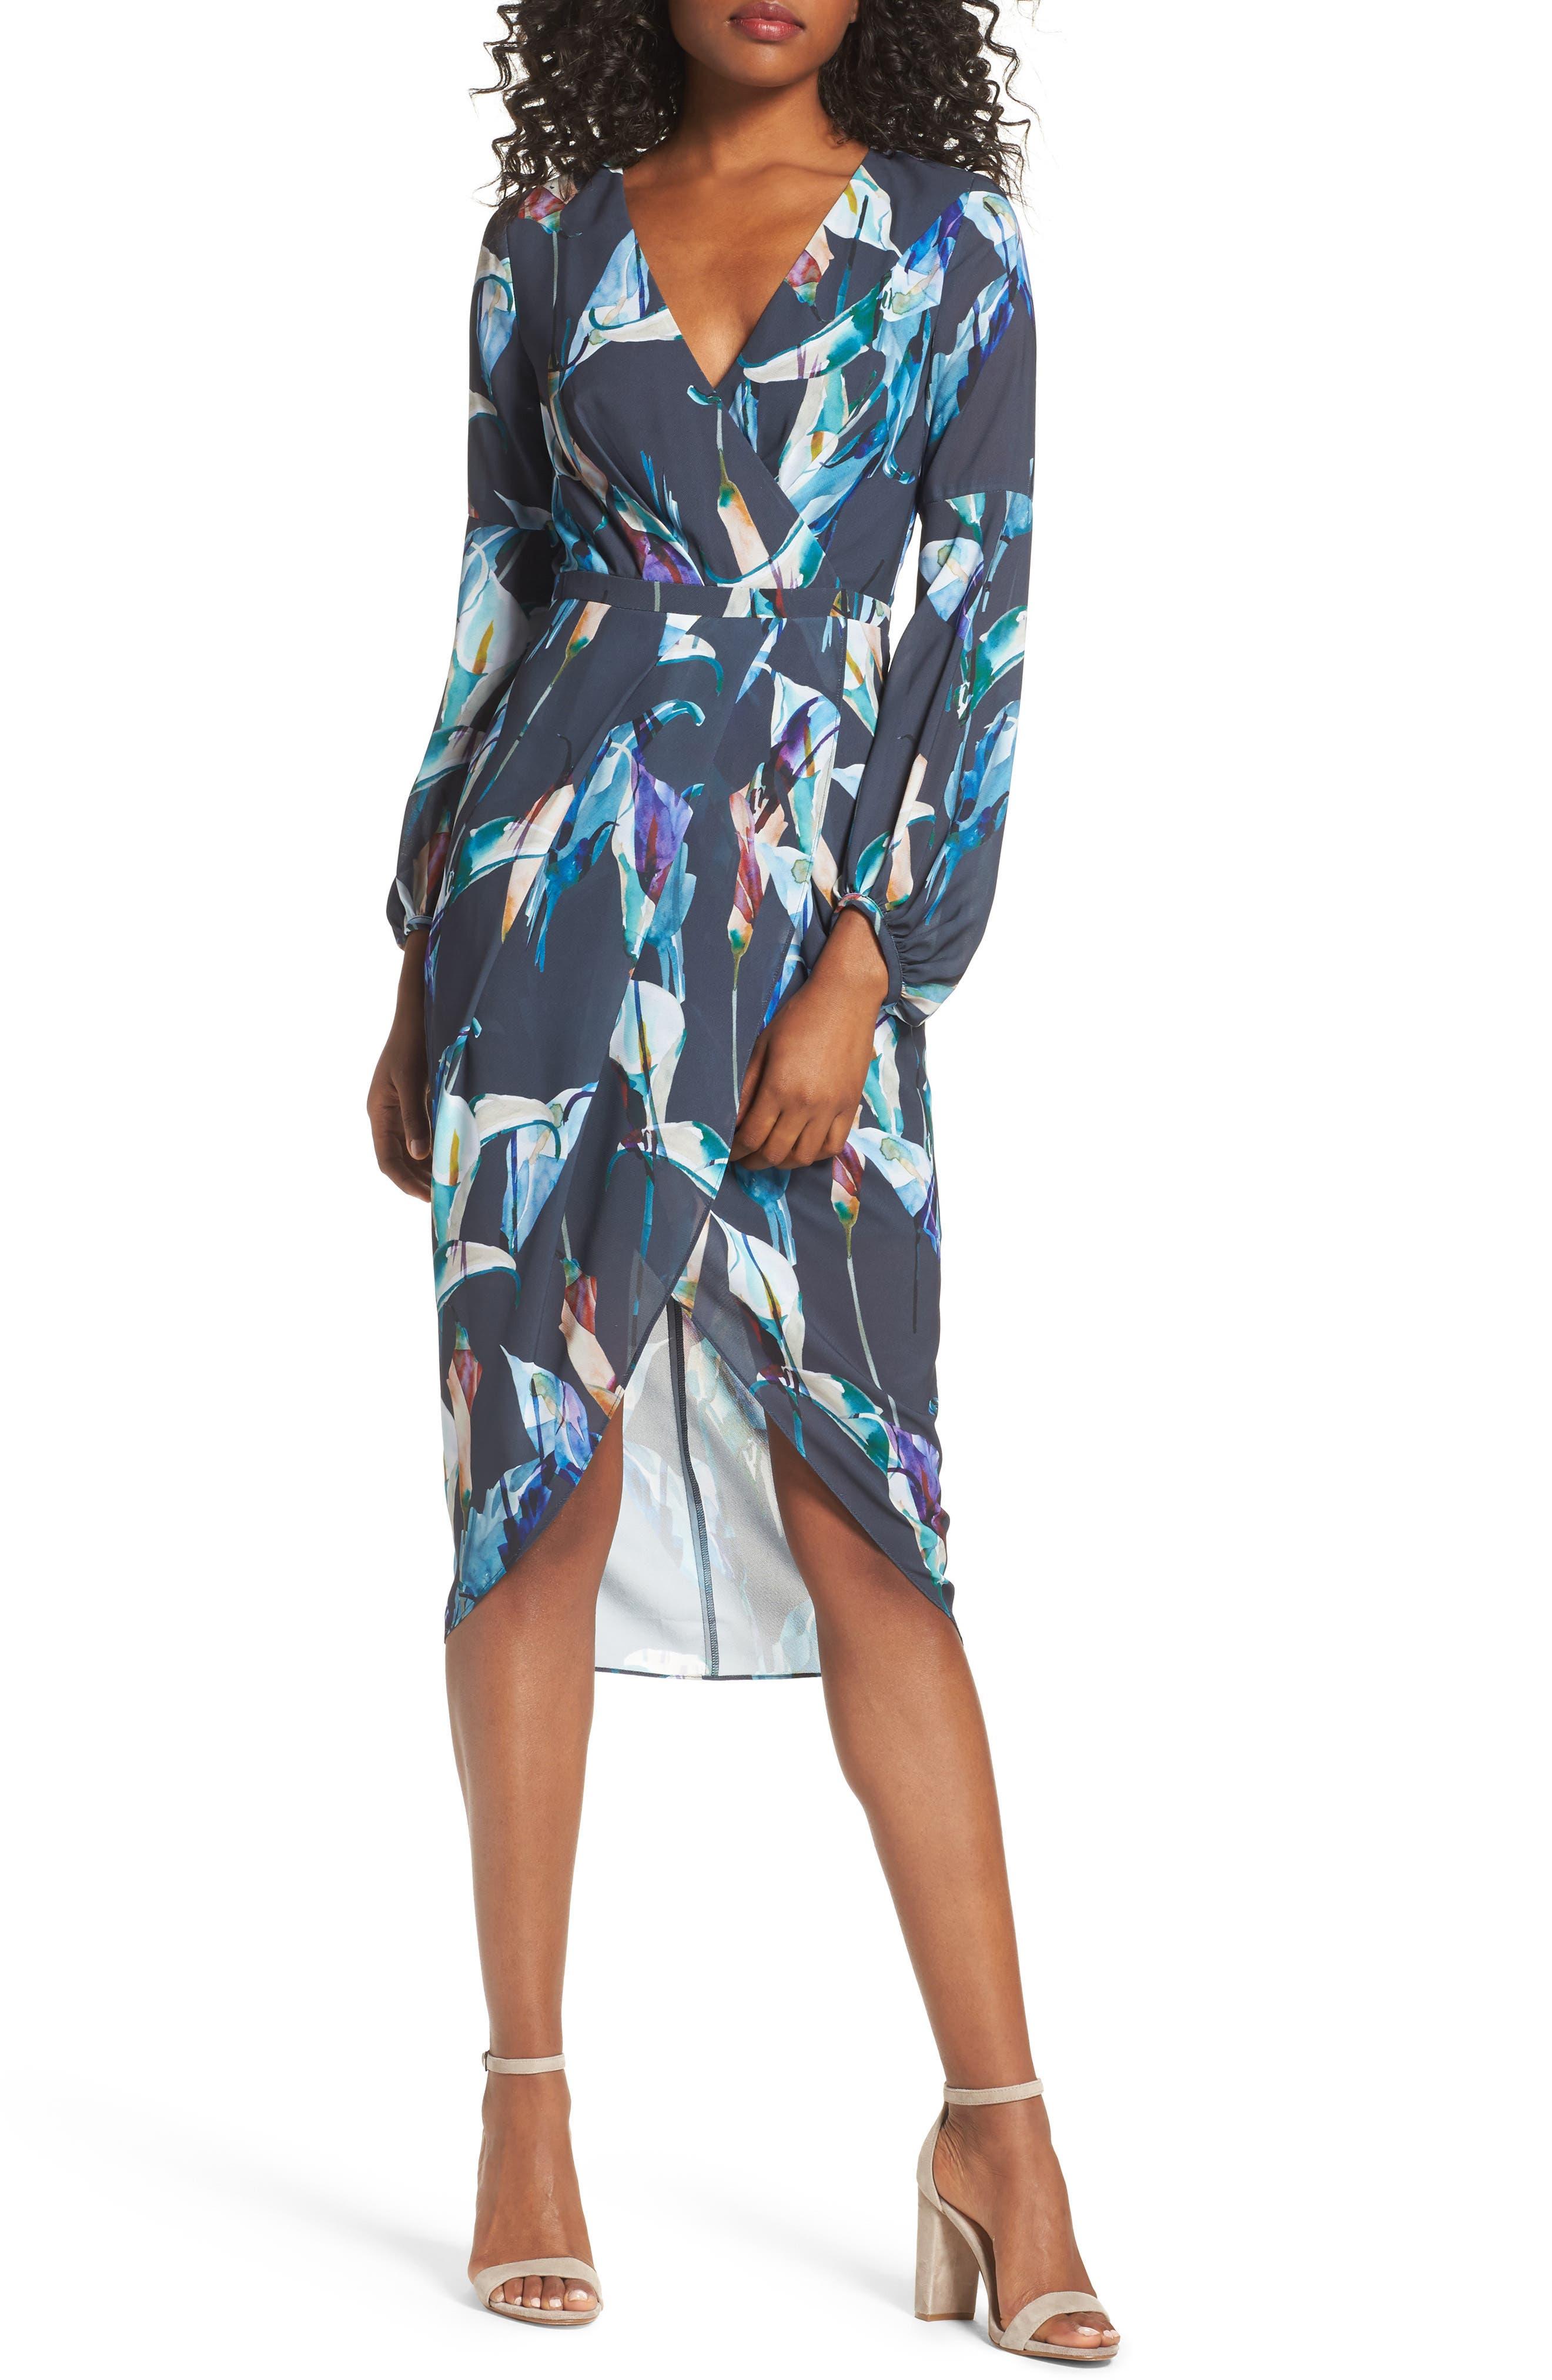 Romanticise Midi Dress,                         Main,                         color, Black/ Aqua